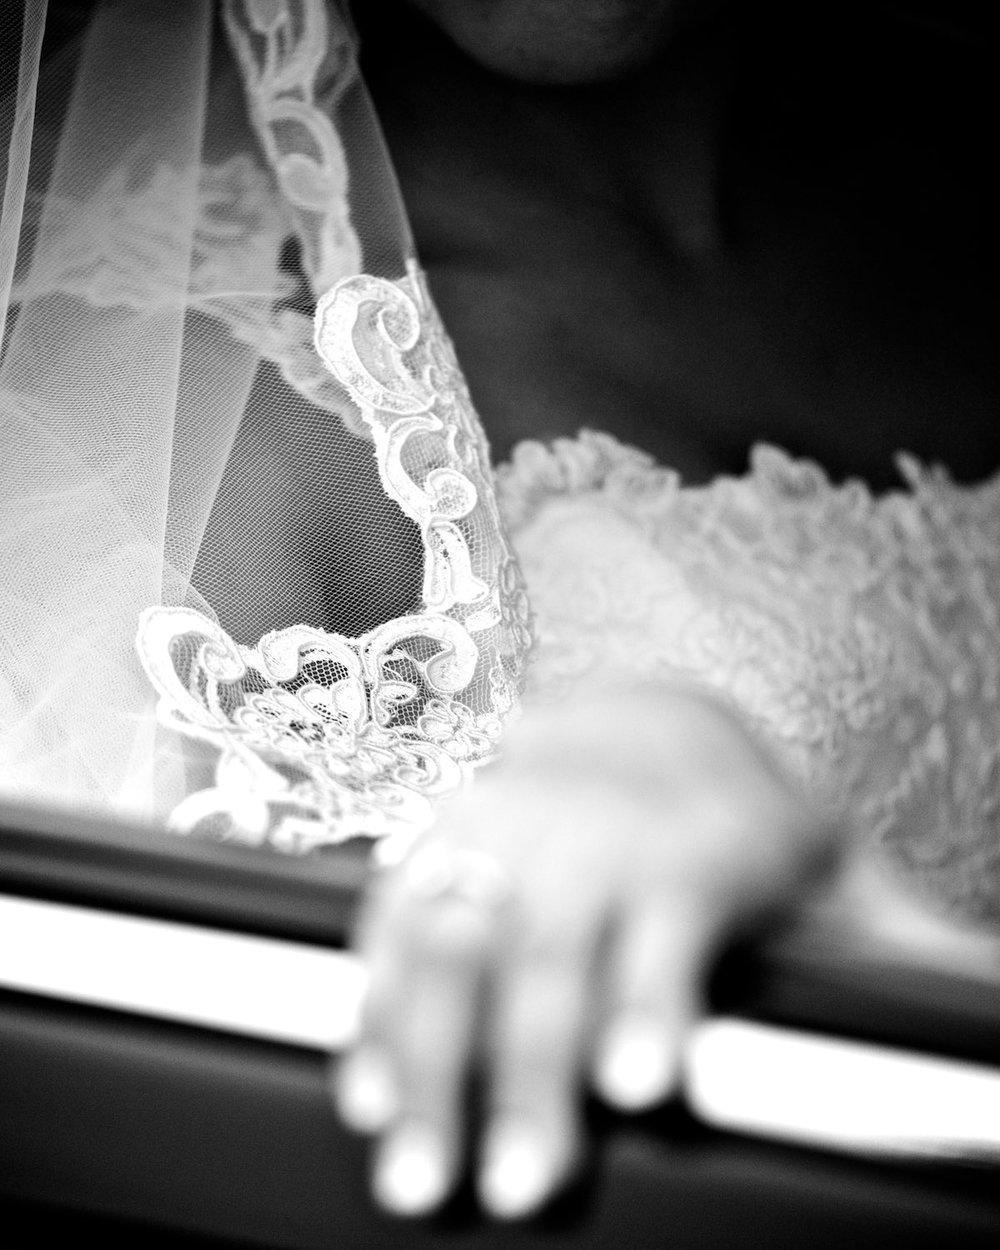 irvine-wedding-michal-pfeil-05.jpg